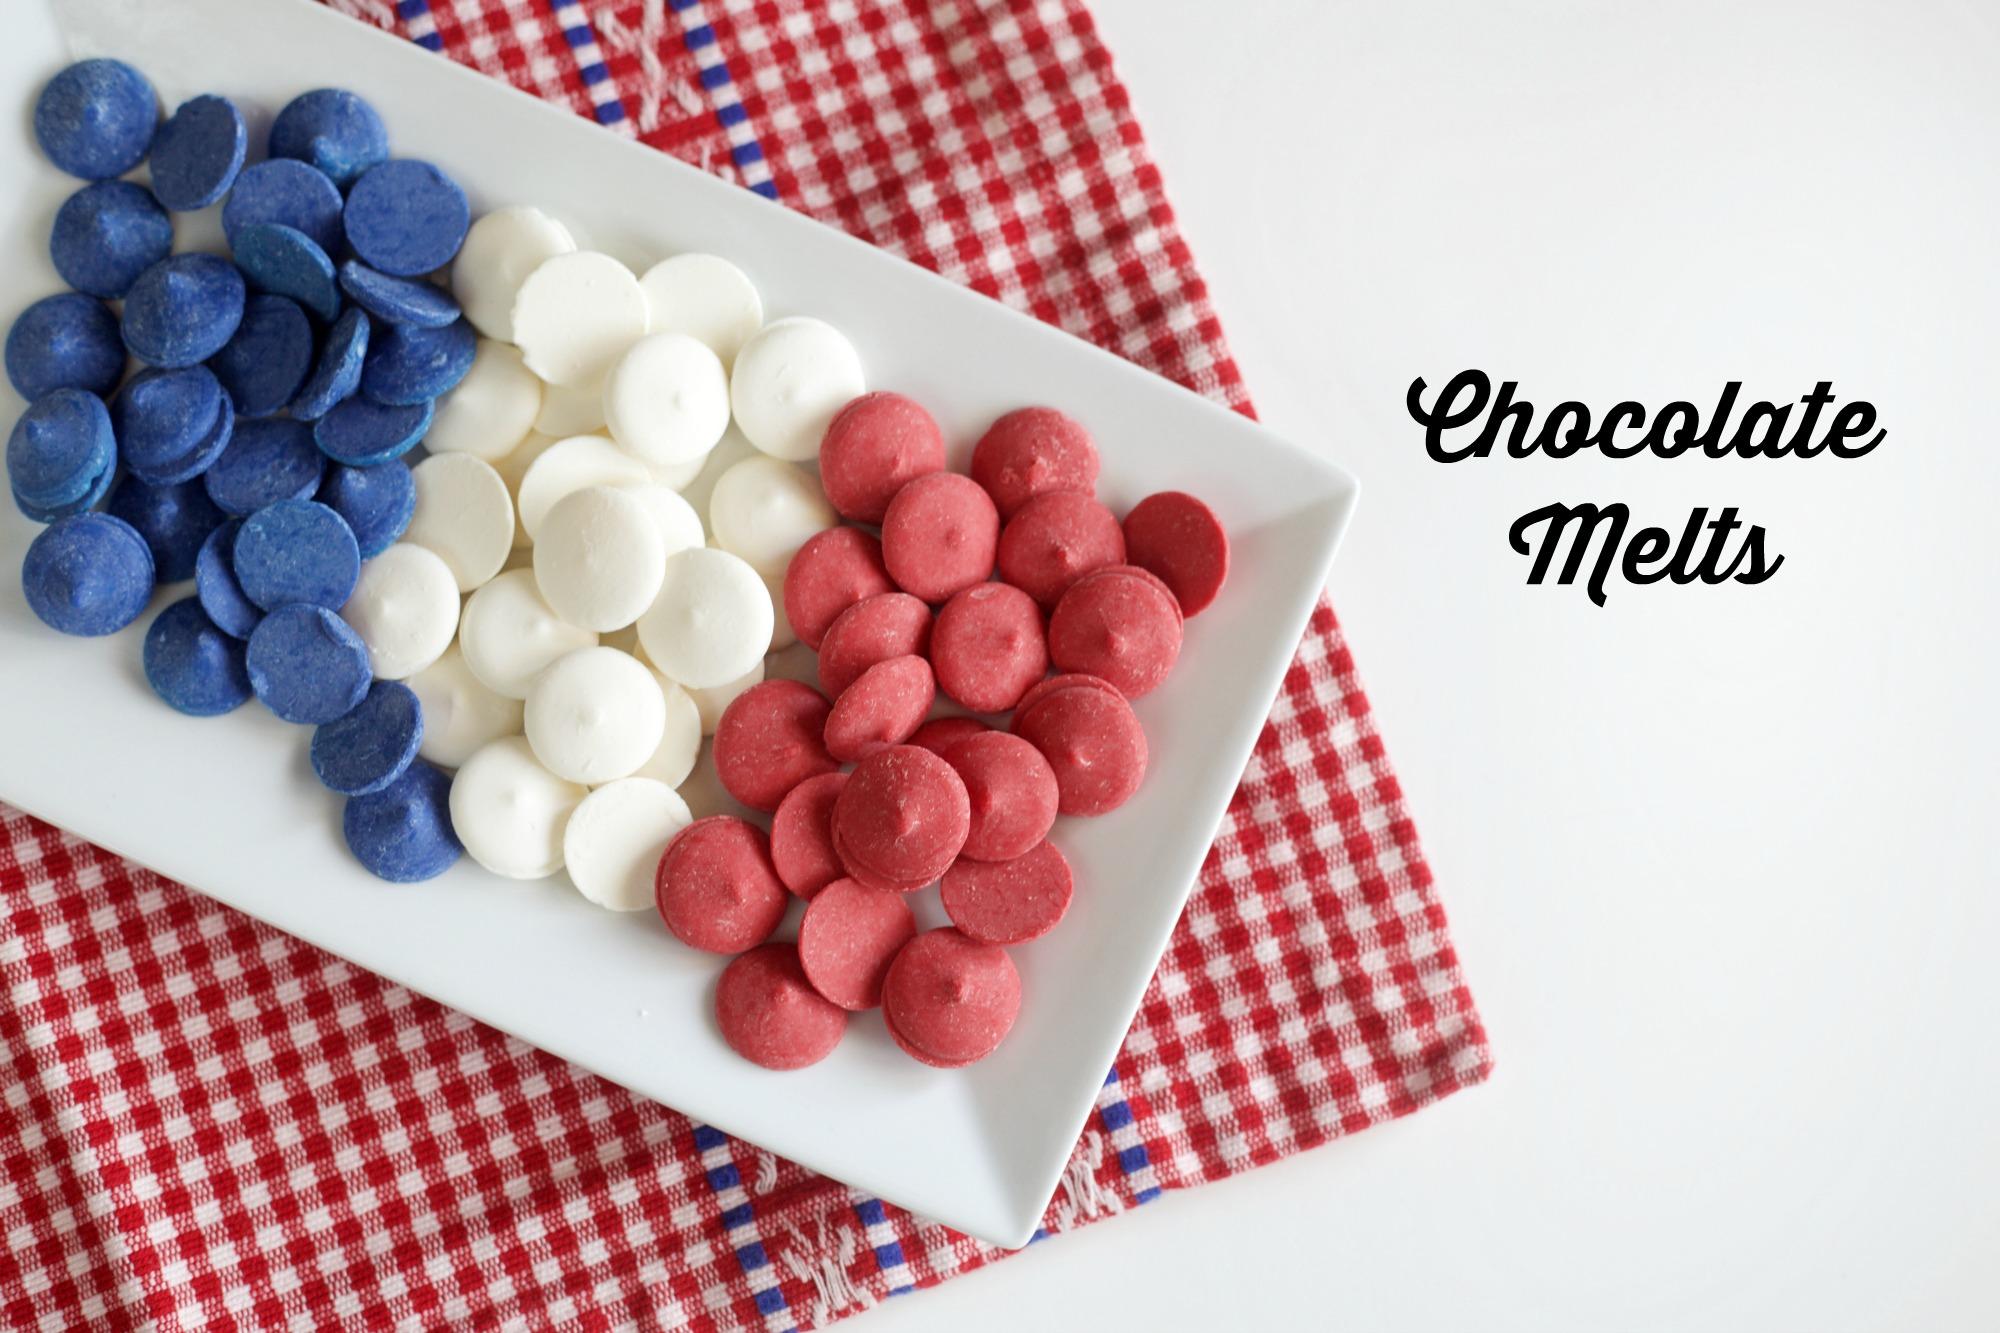 Patriotic Firecracker Dessert | PartiesforPennies.com | 4th of July, Memorial Day, Recipe, Oreos